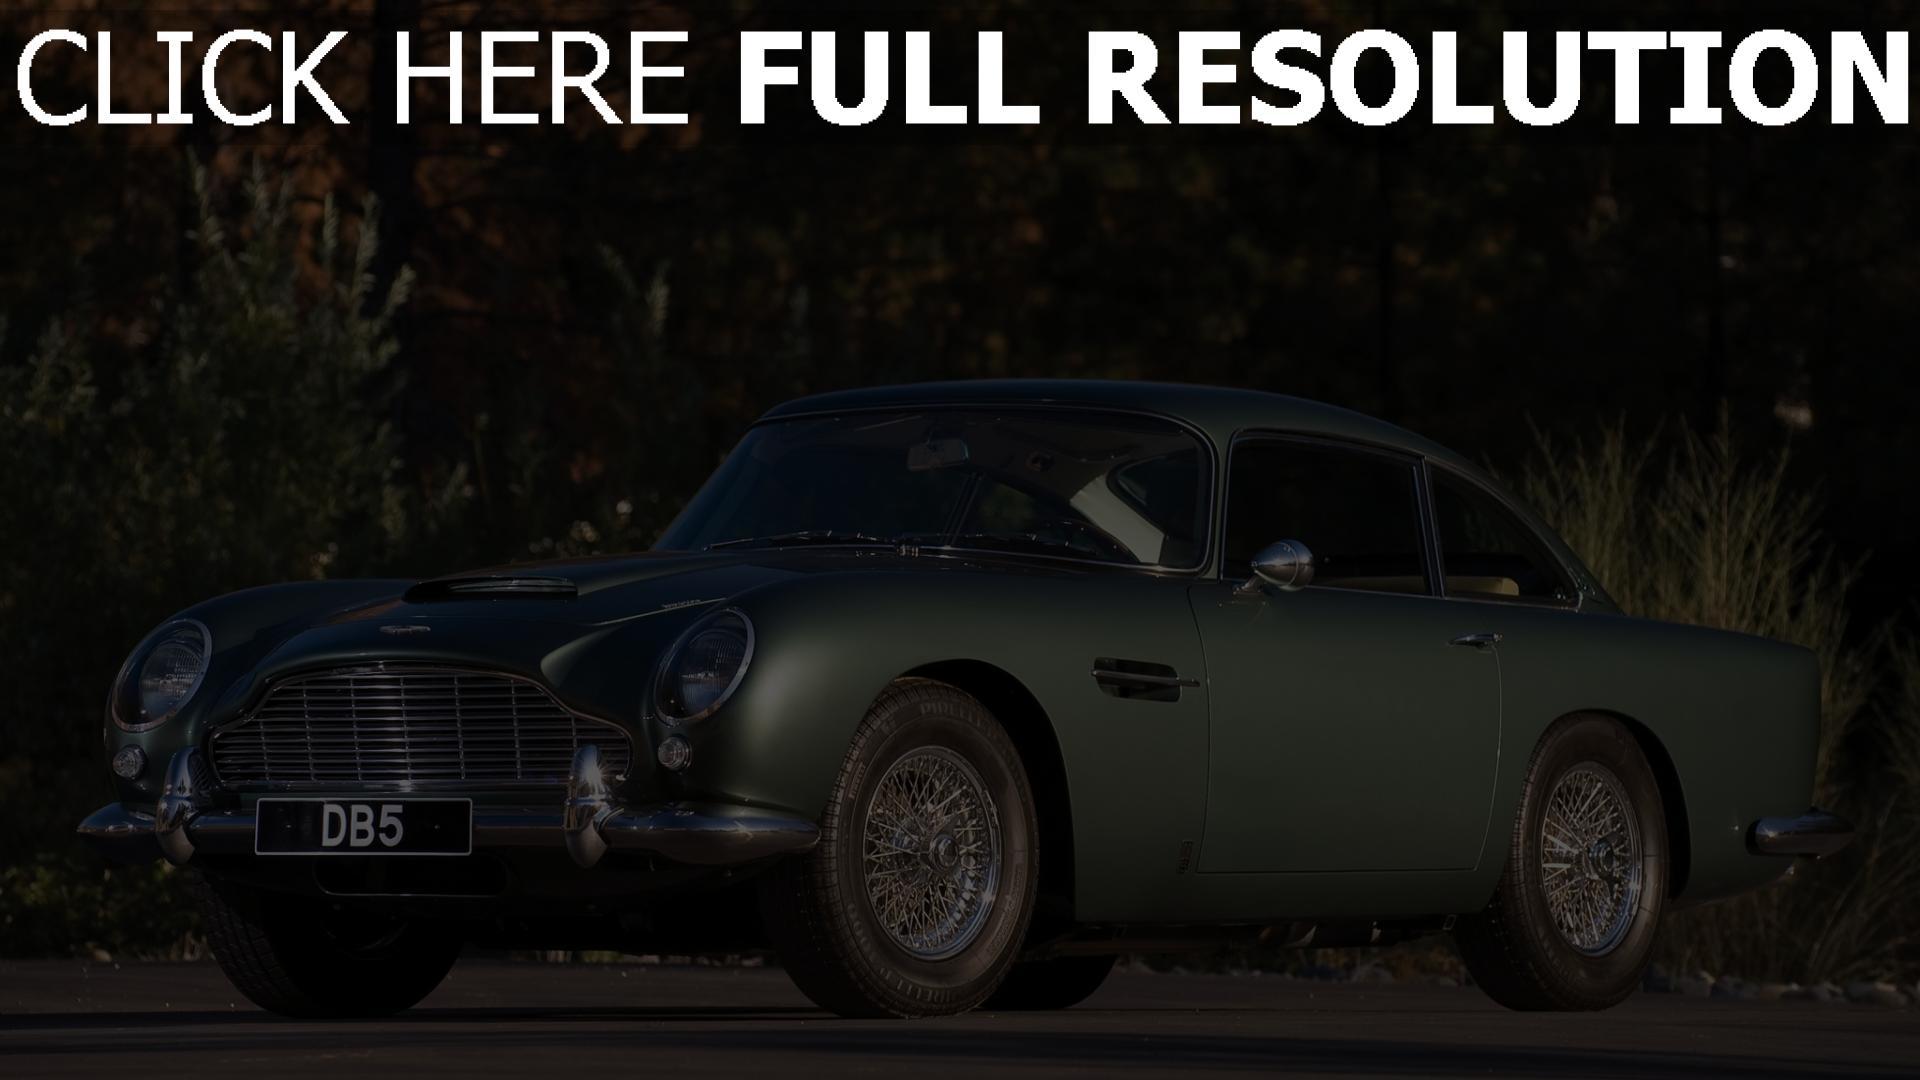 Hd Hintergrundbilder Aston Martin Db5 Gt Oldtimer